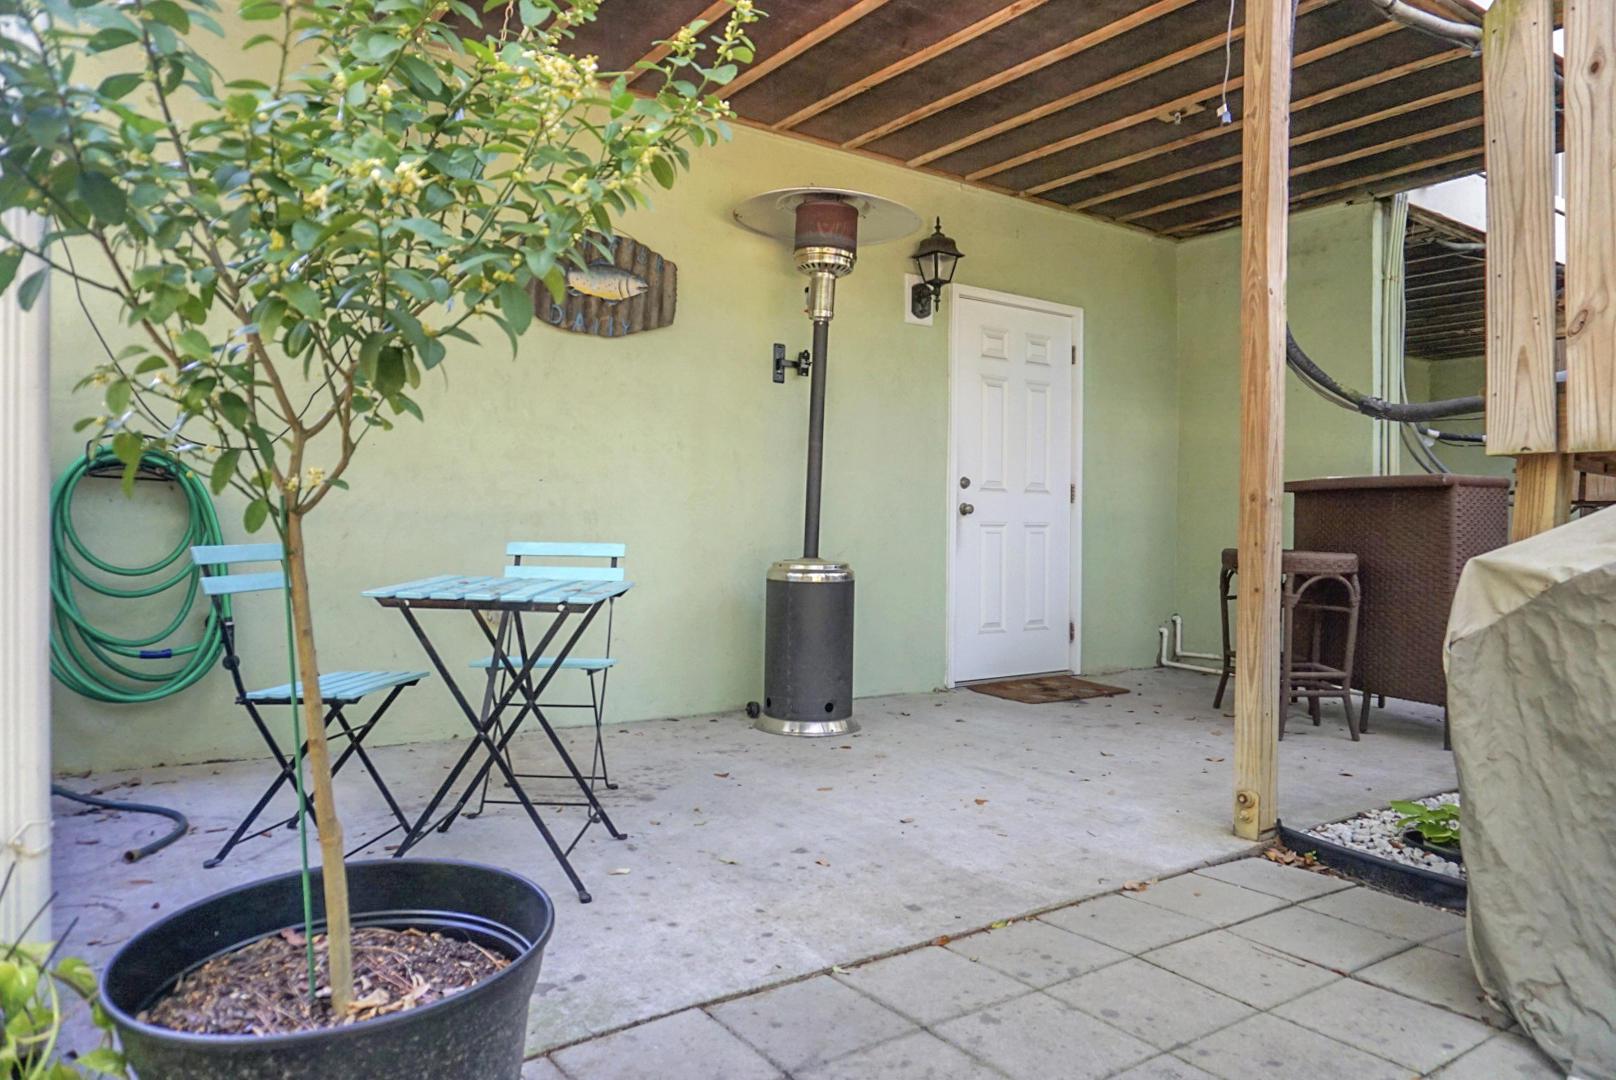 Etiwan Pointe Homes For Sale - 269 Etiwan Pointe, Mount Pleasant, SC - 7